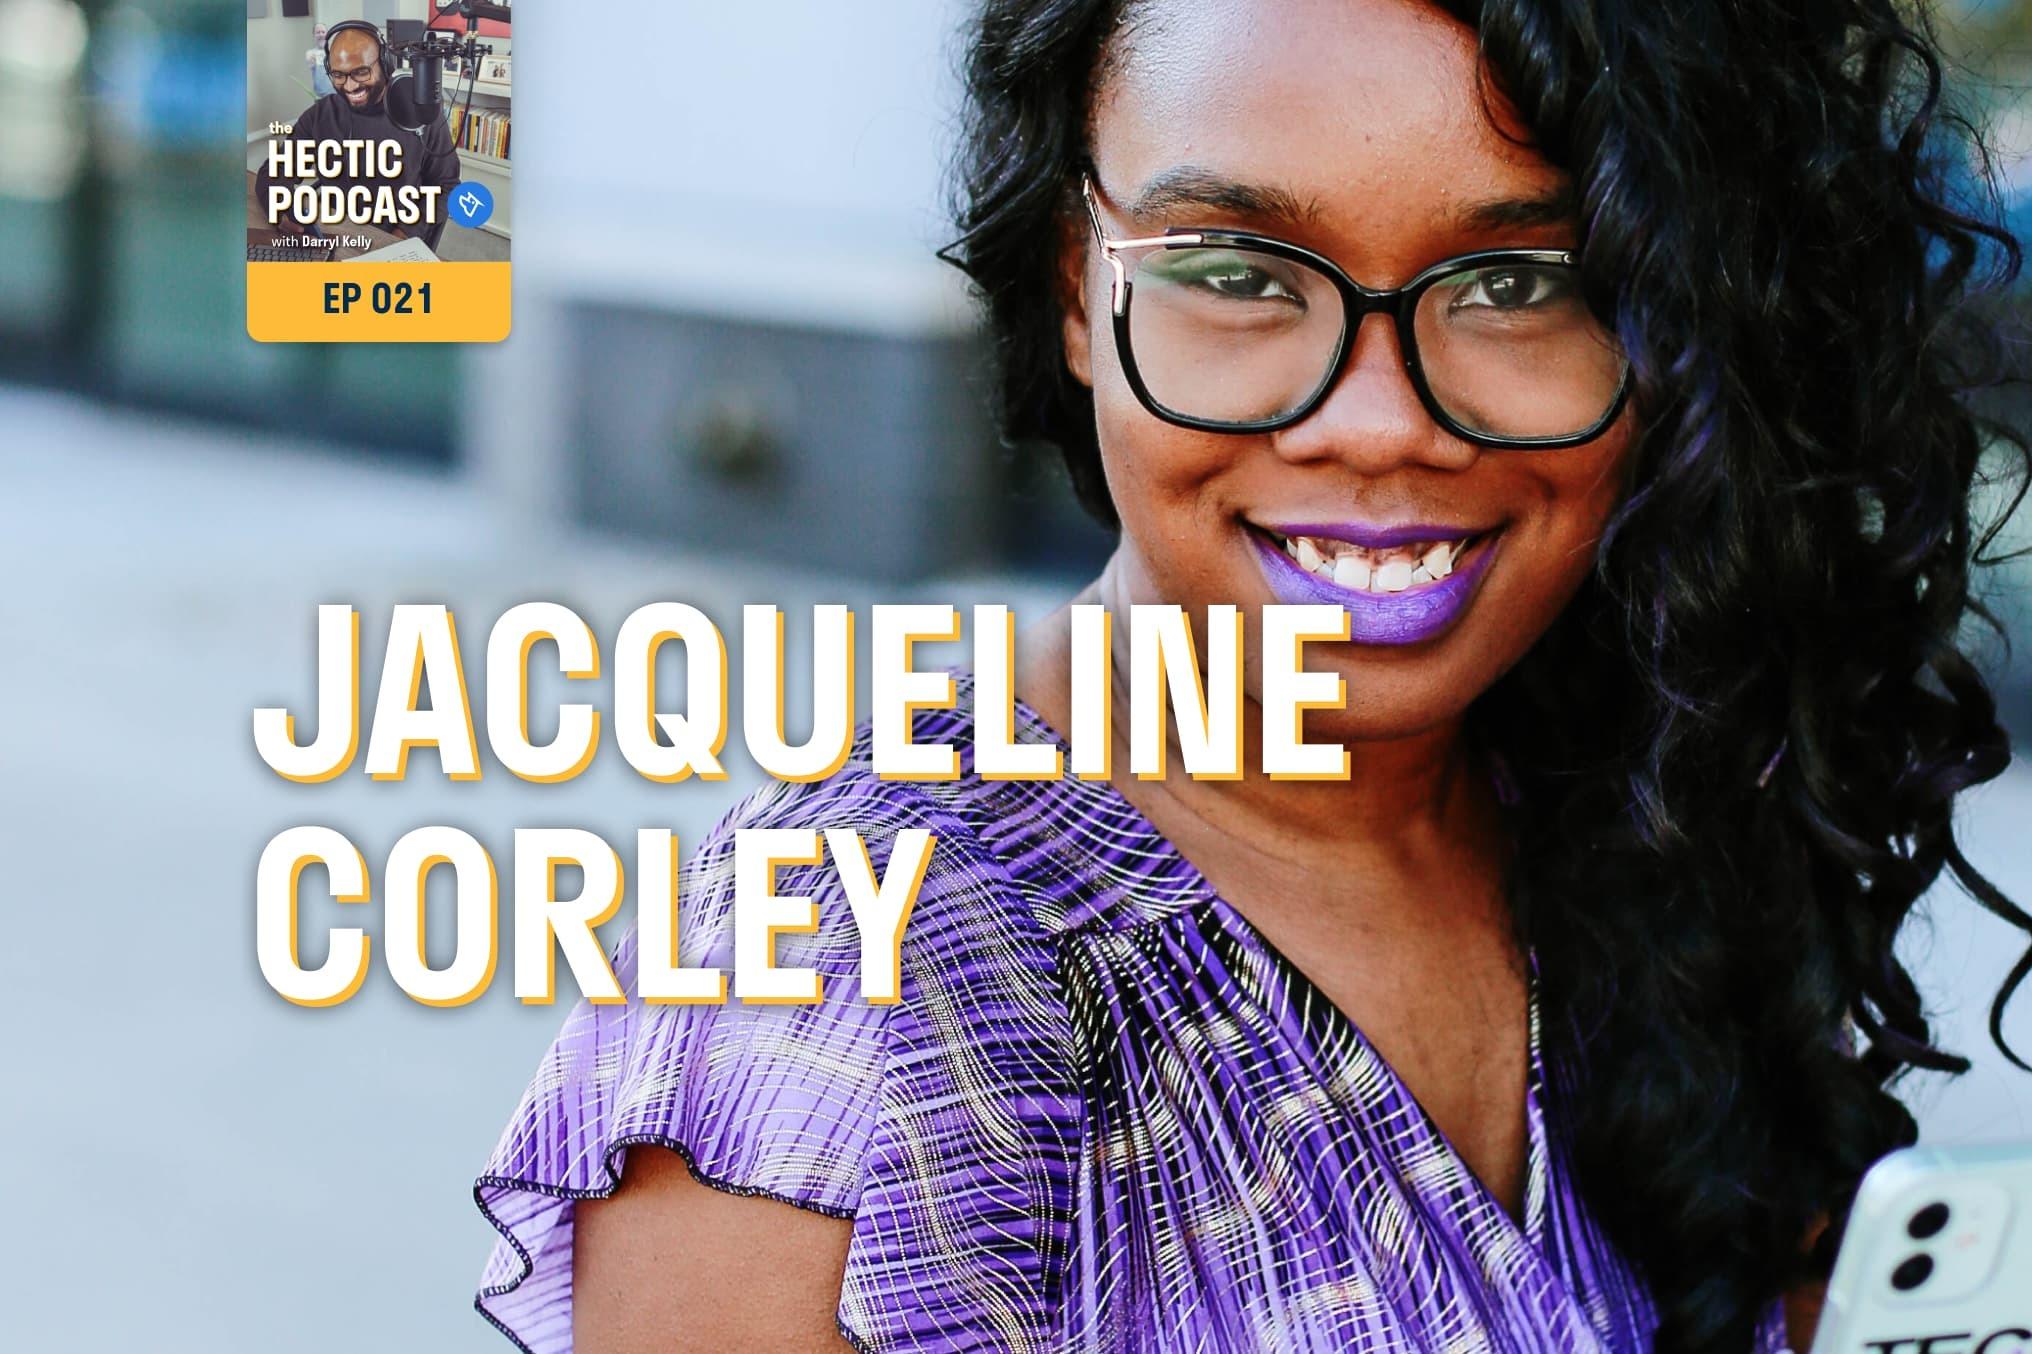 Jacqueline Corley